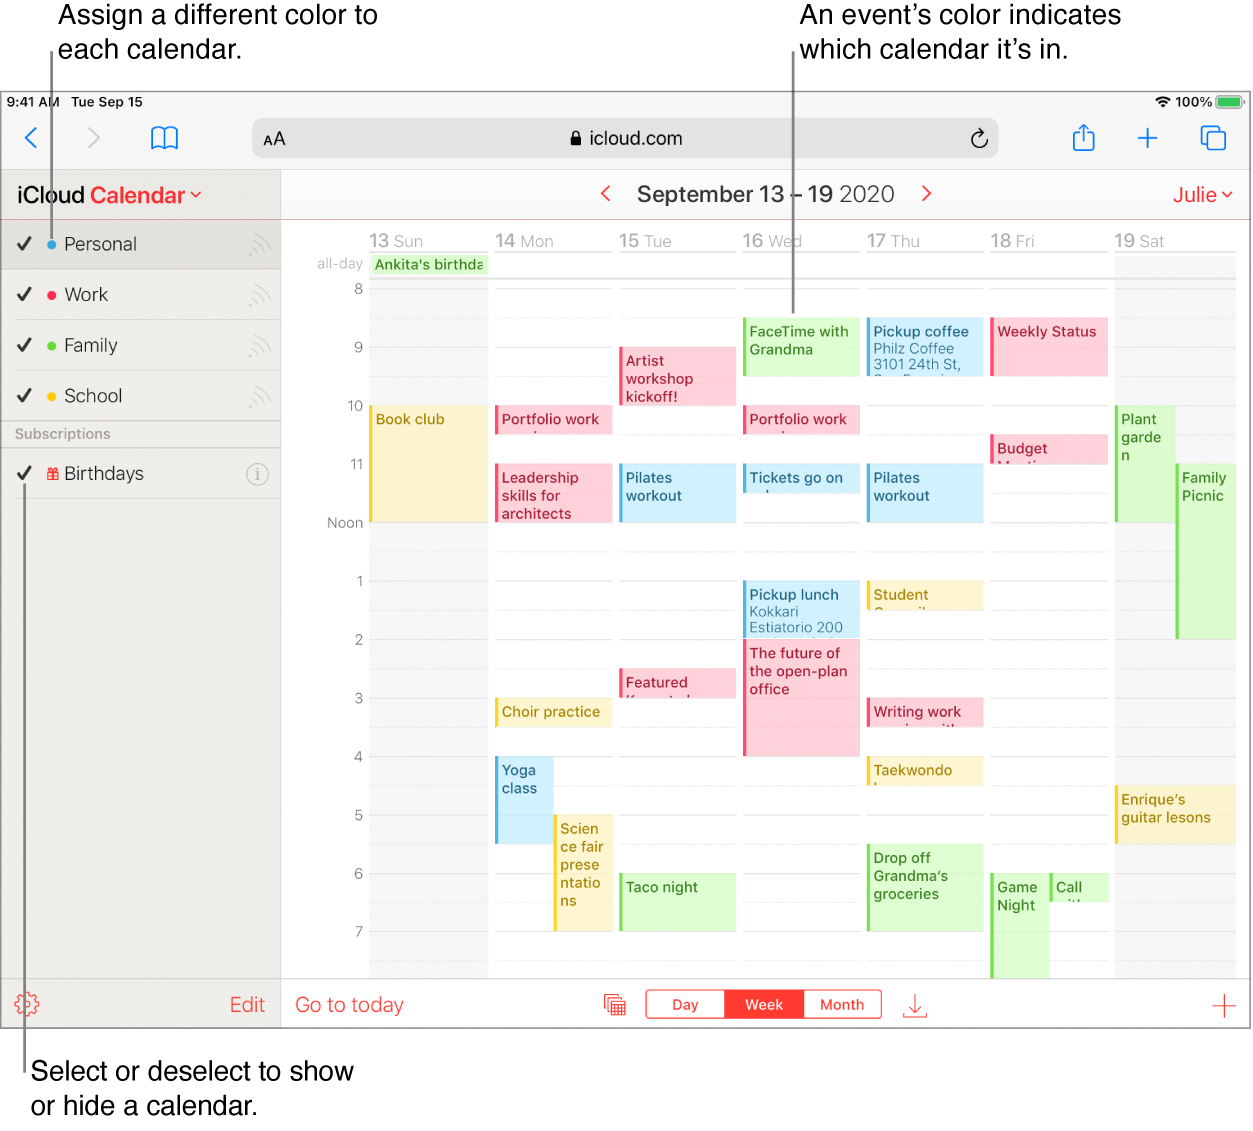 Ventana Calendario de iCloud con varios calendarios visibles. Asigna un color diferente a cada calendario. El color de un evento indica a qué calendario pertenece. Selecciona o anula la selección de la marca de verificación para mostrar u ocultar un calendario.